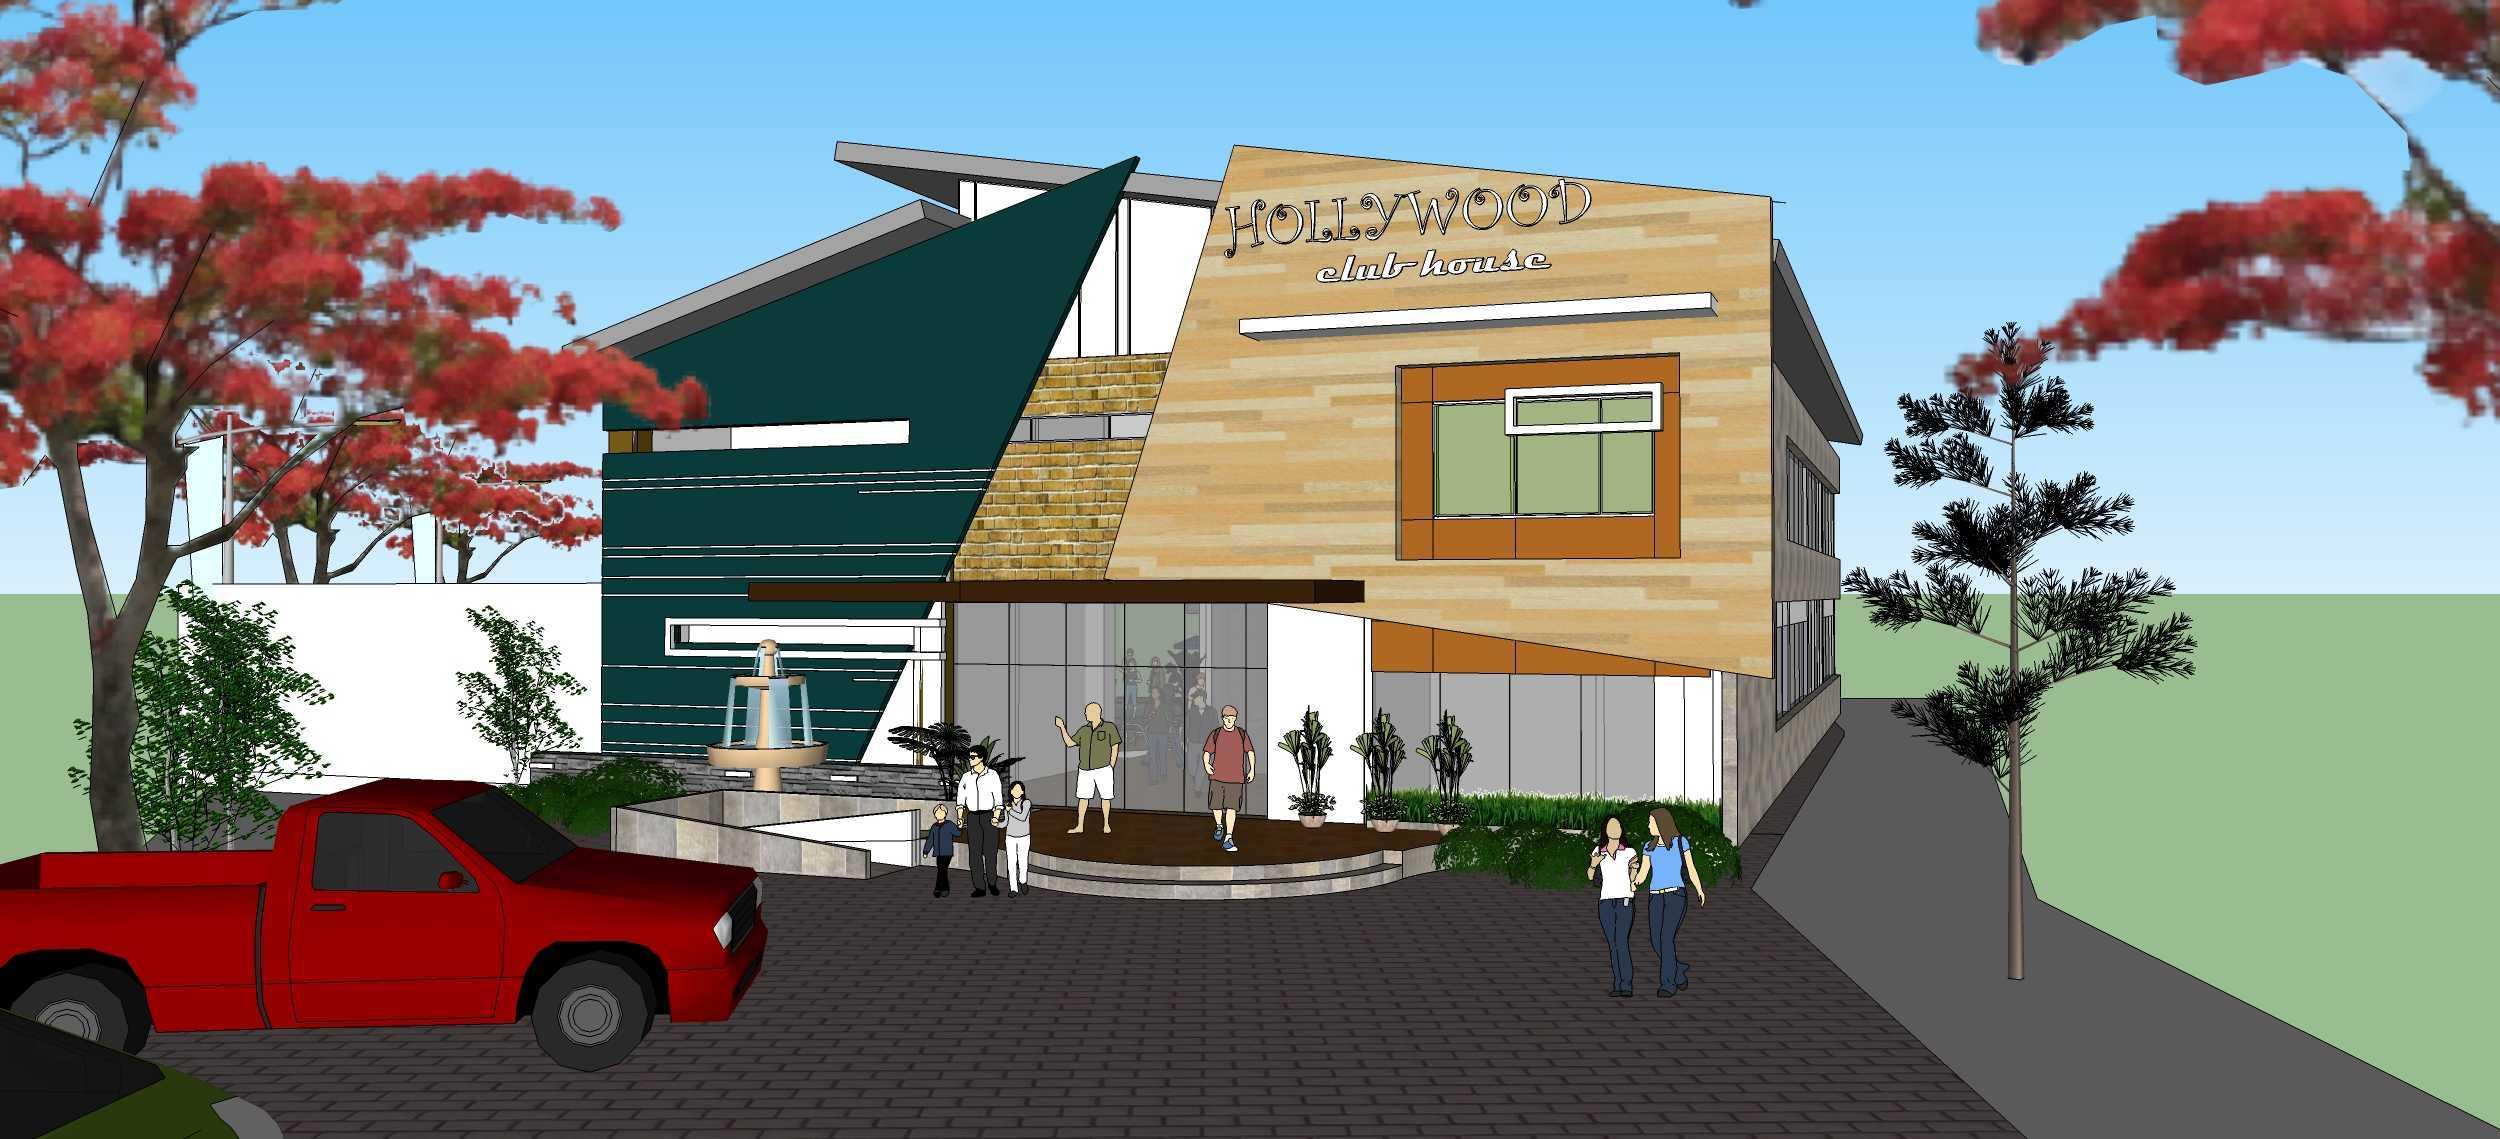 Wicaksono Pandyo Prasasto Hollywood Square Bogor, Jawa Barat Bogor, Jawa Barat Club-House-2   27005